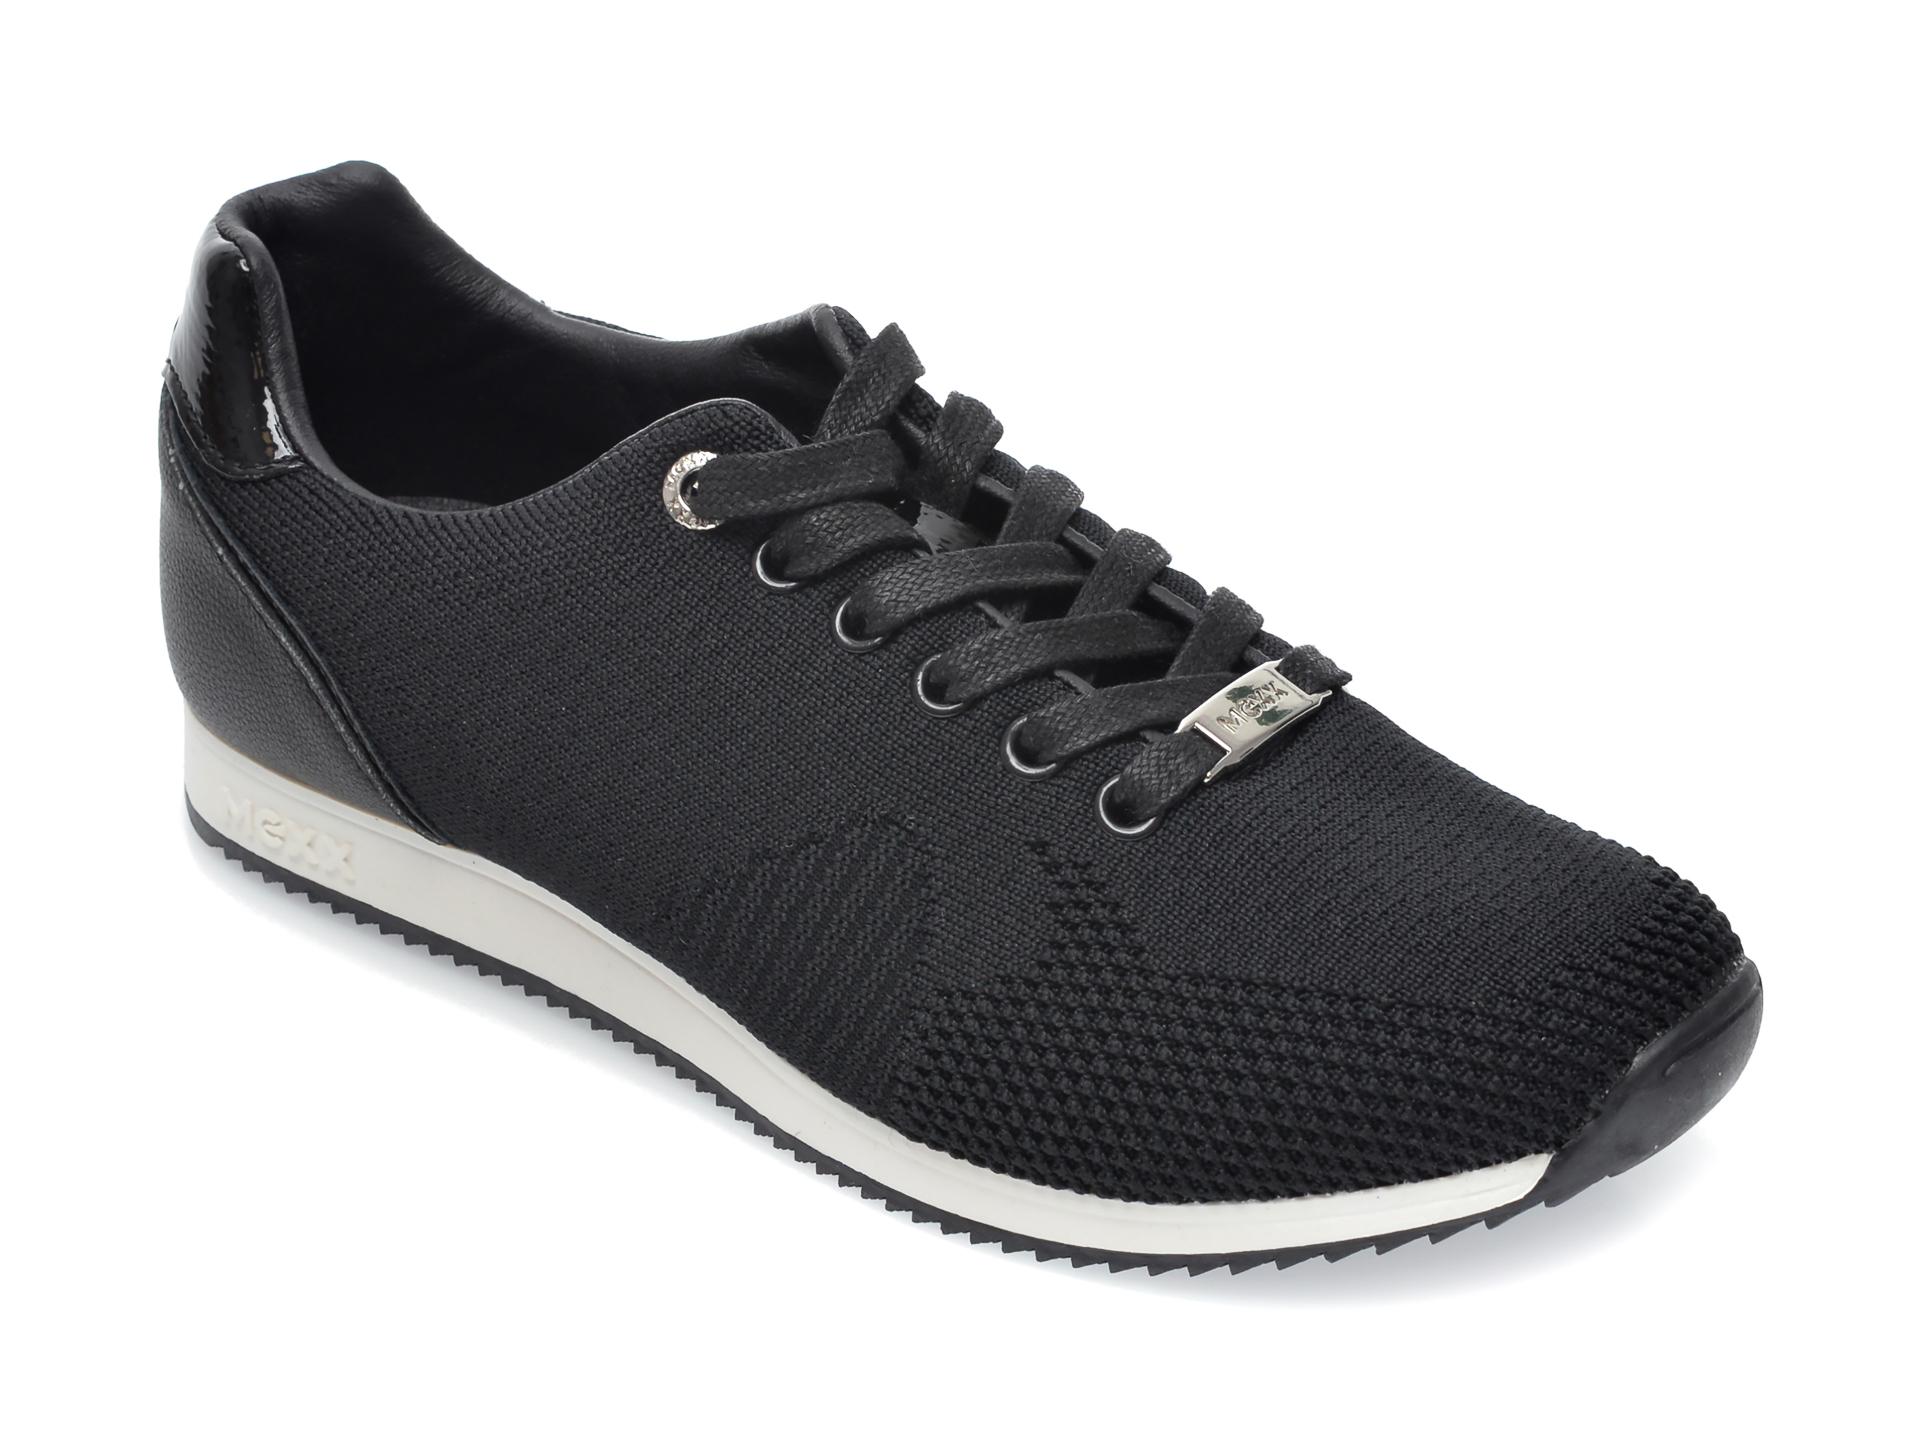 Pantofi sport MEXX negri, K0181, din material textil si piele ecologica